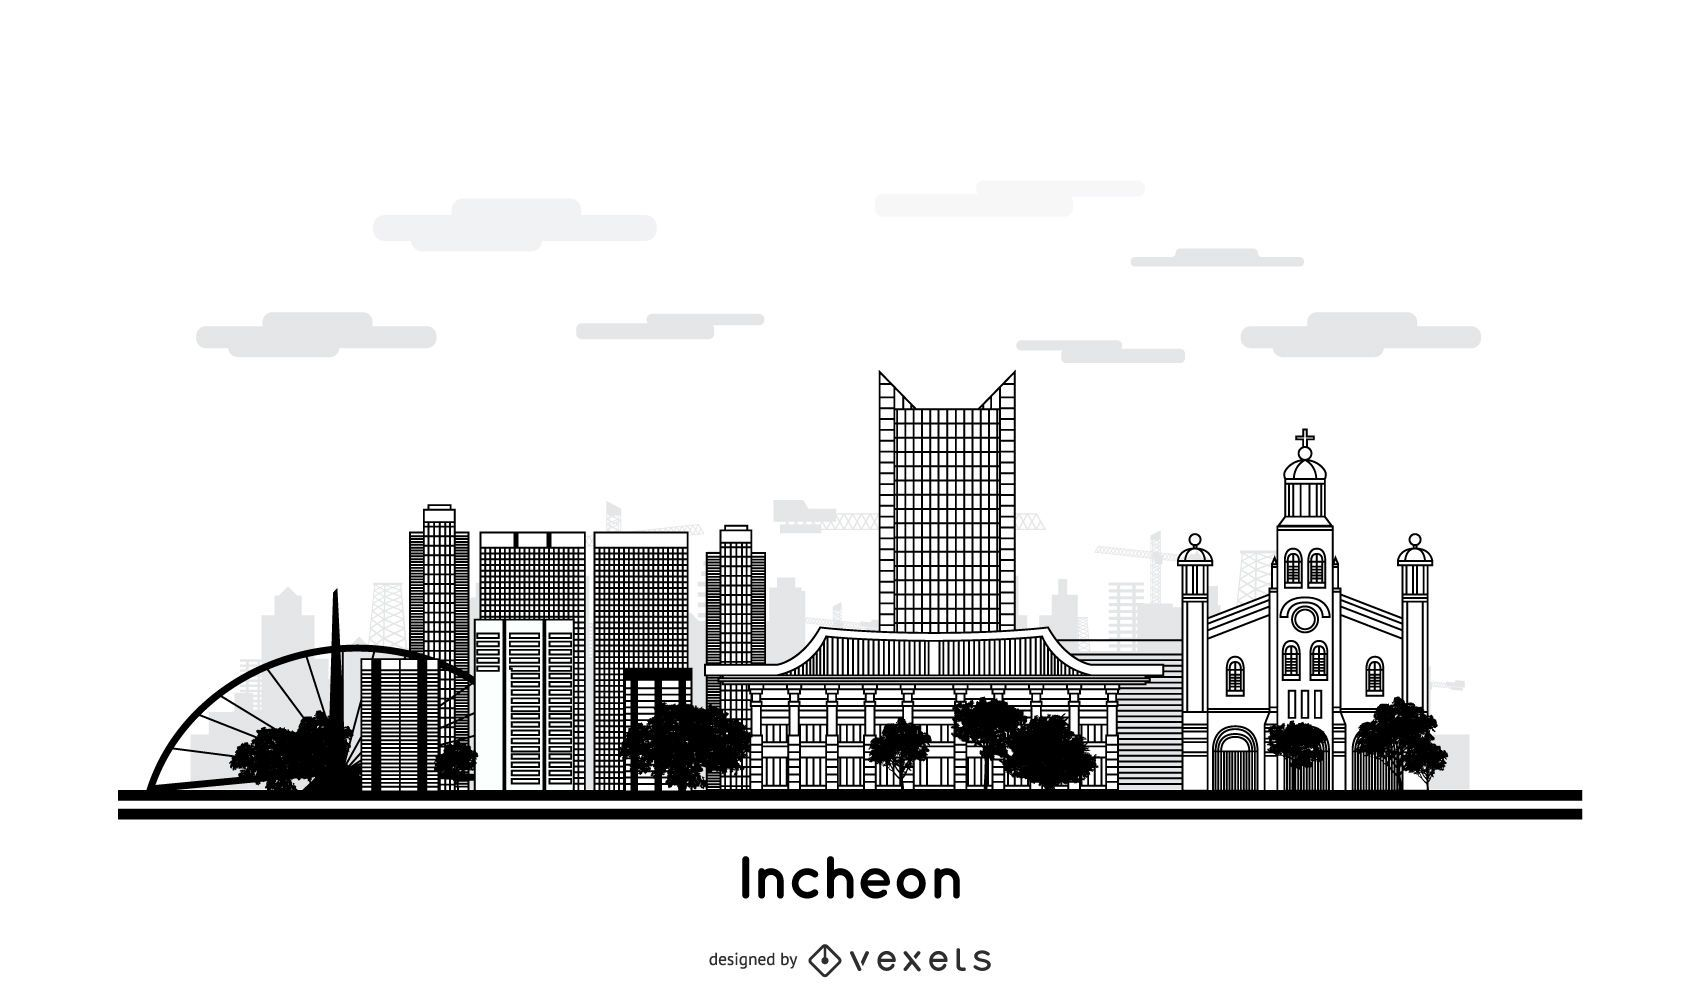 Projeto do horizonte da cidade de Incheon